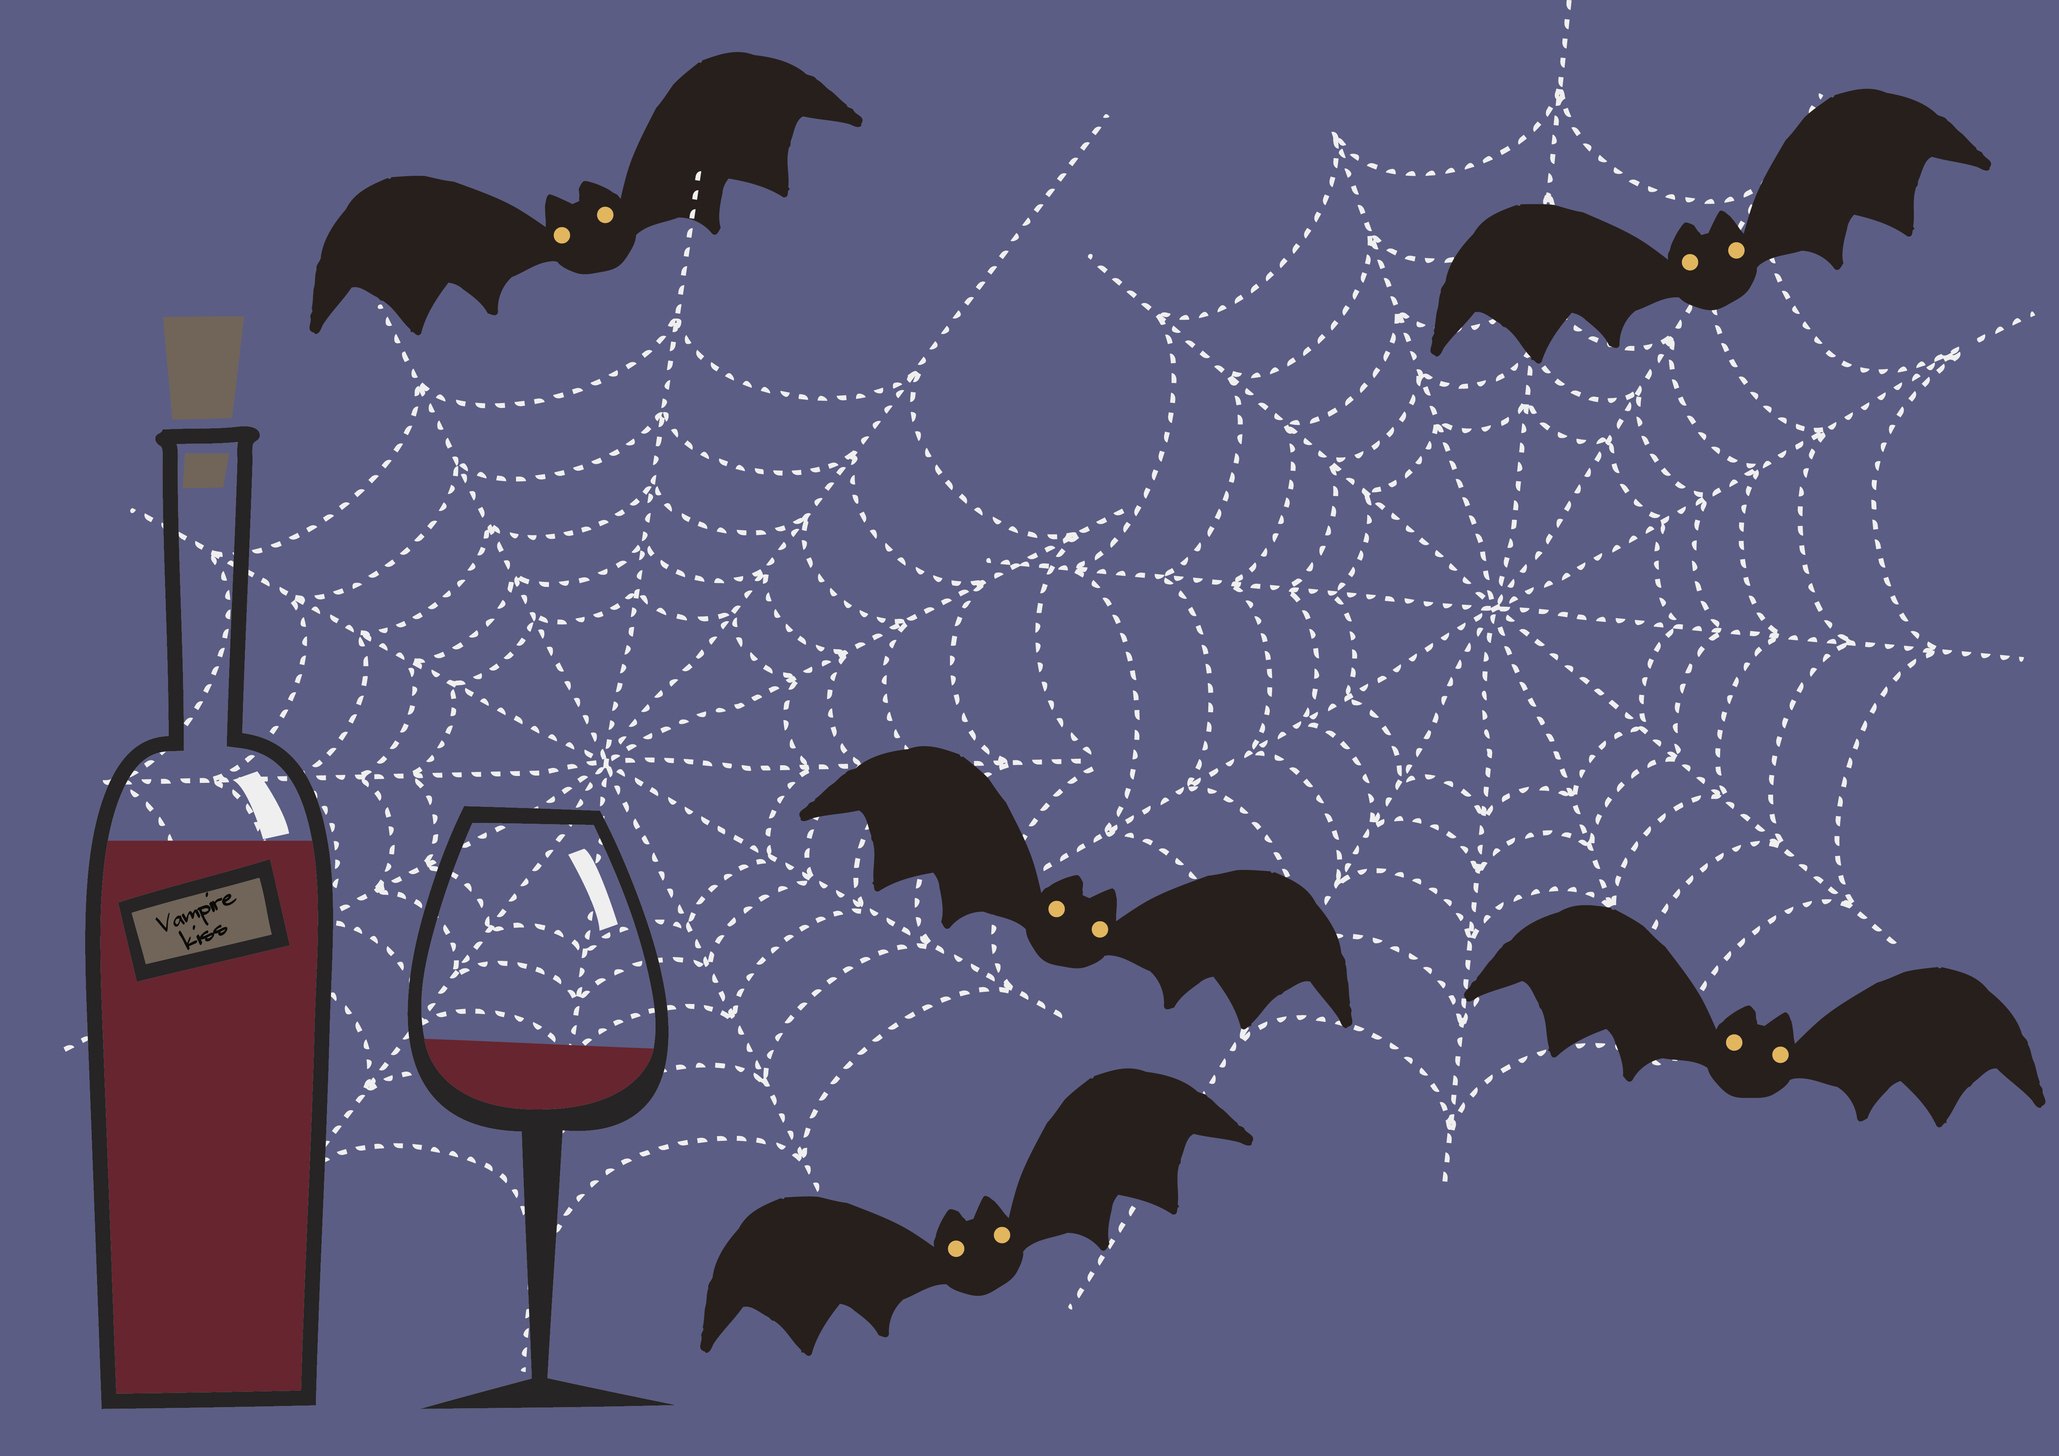 halloween_rajzolt_bor_denever.jpg